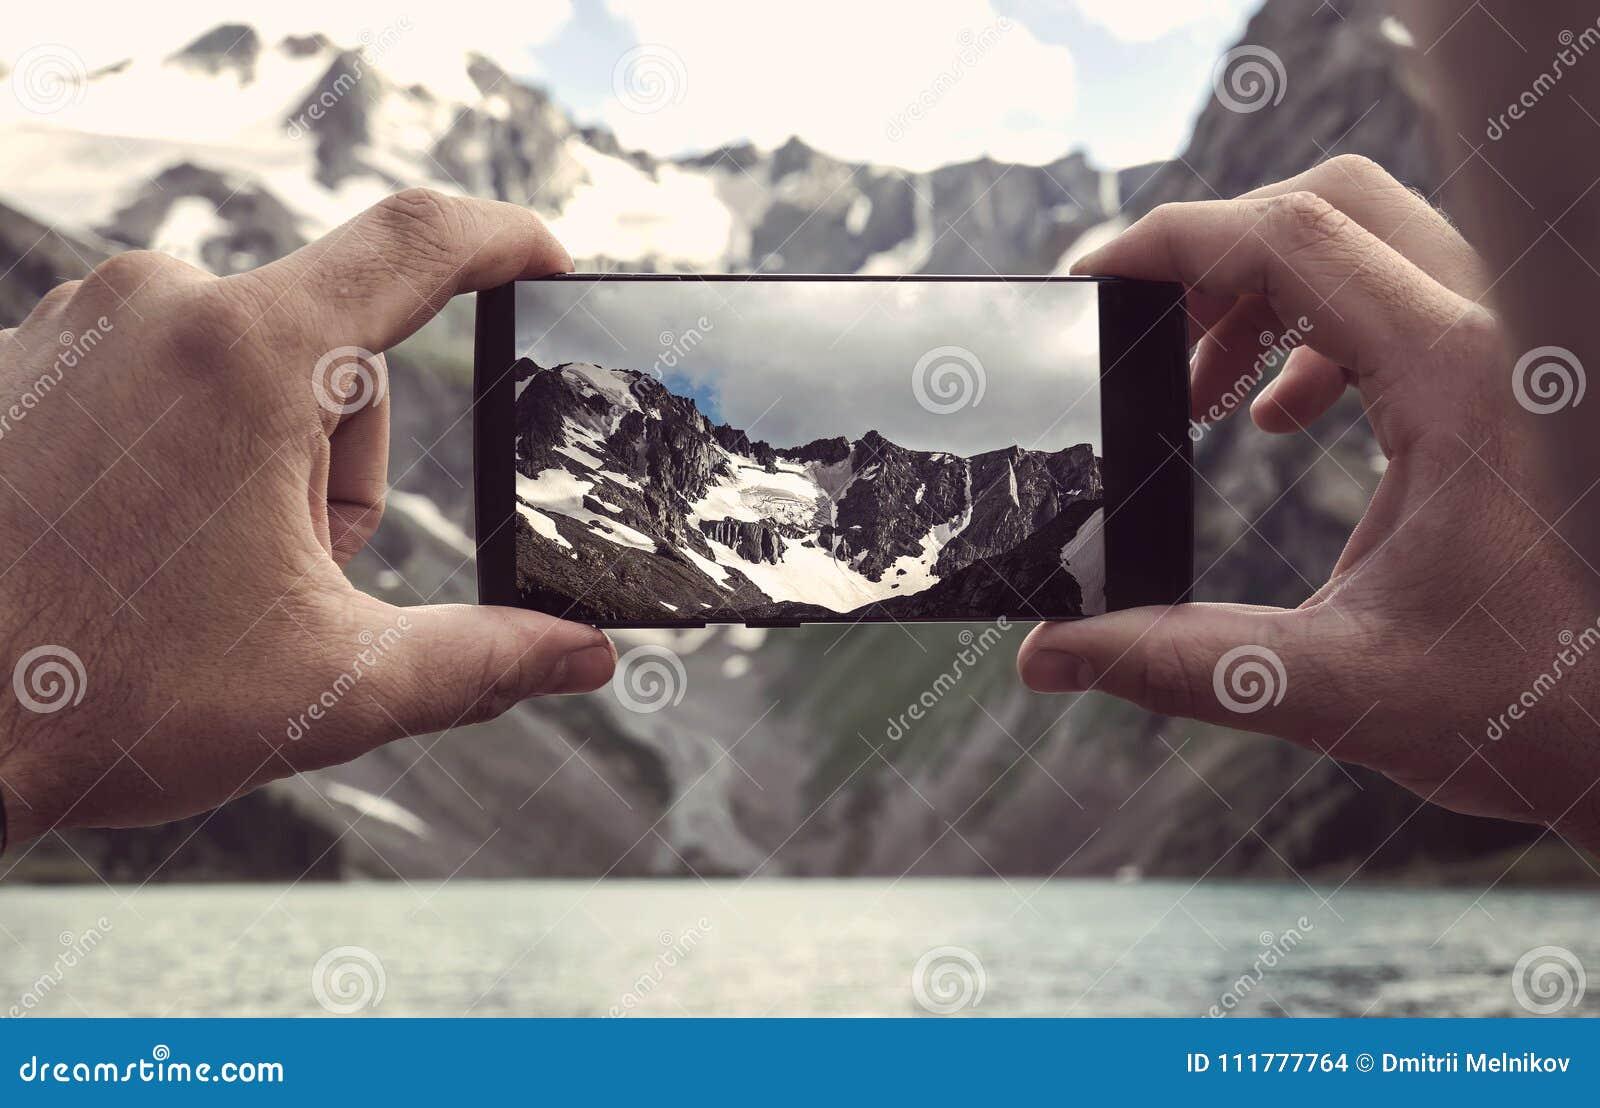 Man using smart phone take a photo